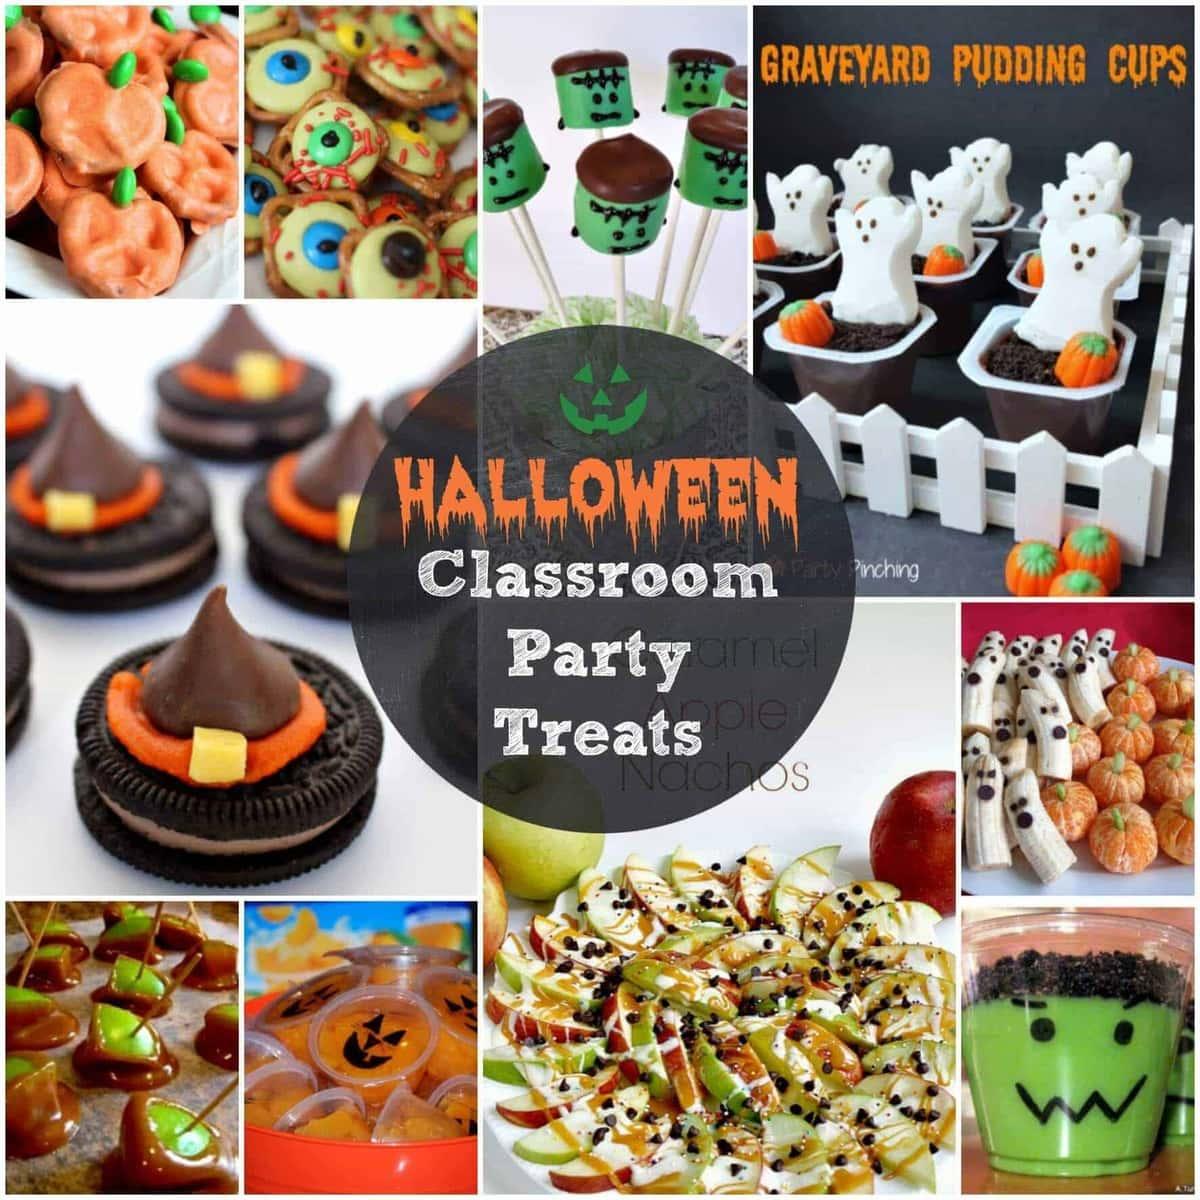 Easy Halloween Treats For Your Classroom Parties